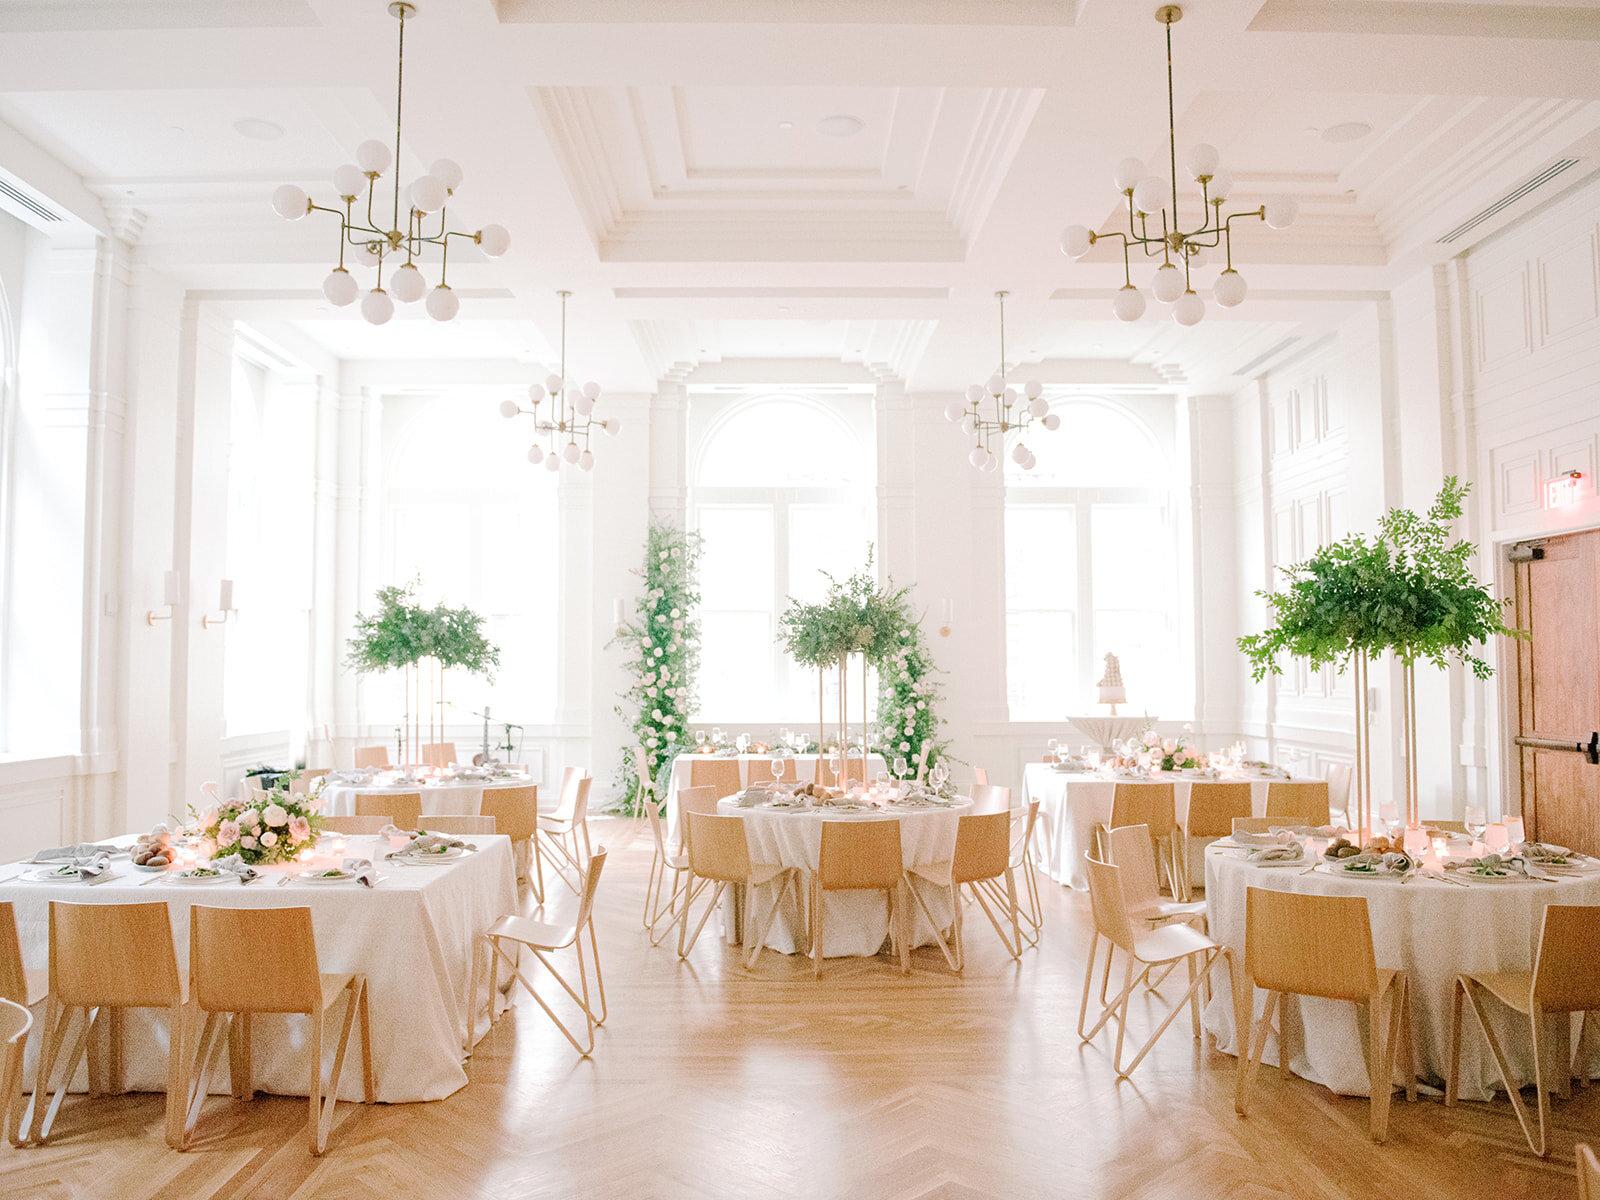 Blush garden roses, white ranunculus, and garden-inspired greenery. Organic wedding floral design at the Noelle in Nashville.